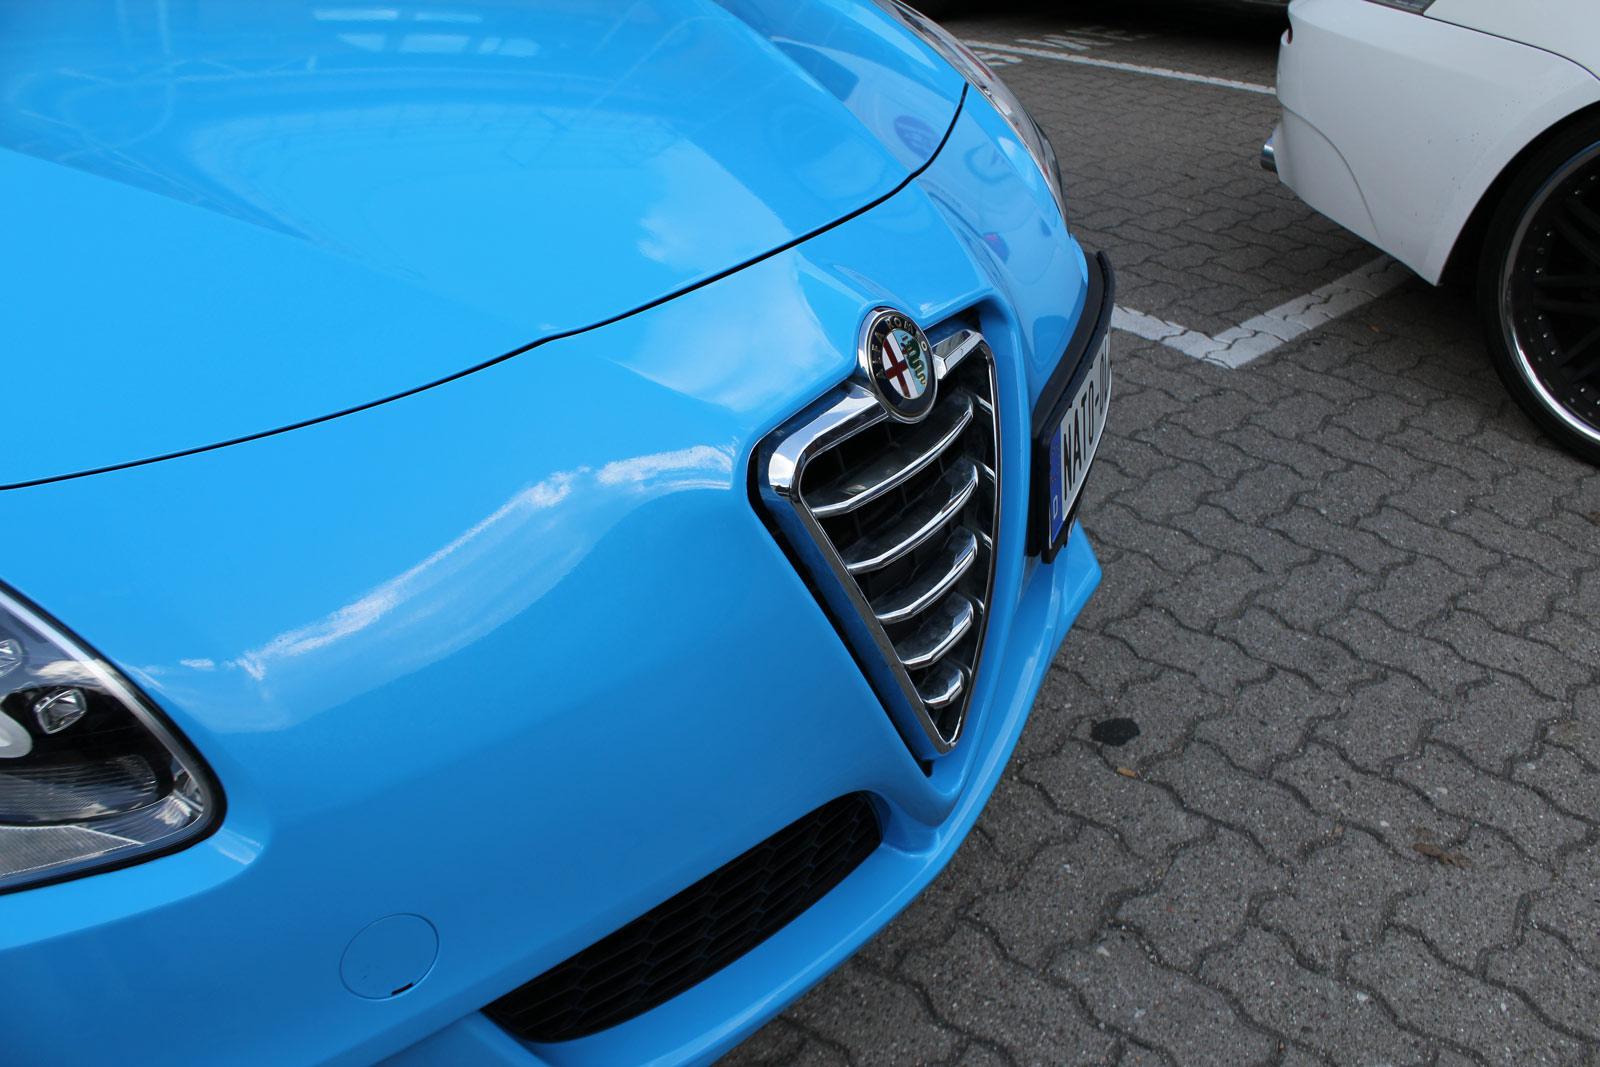 Alfa_Romeo_Giulietta_Folierung_Cyan_27